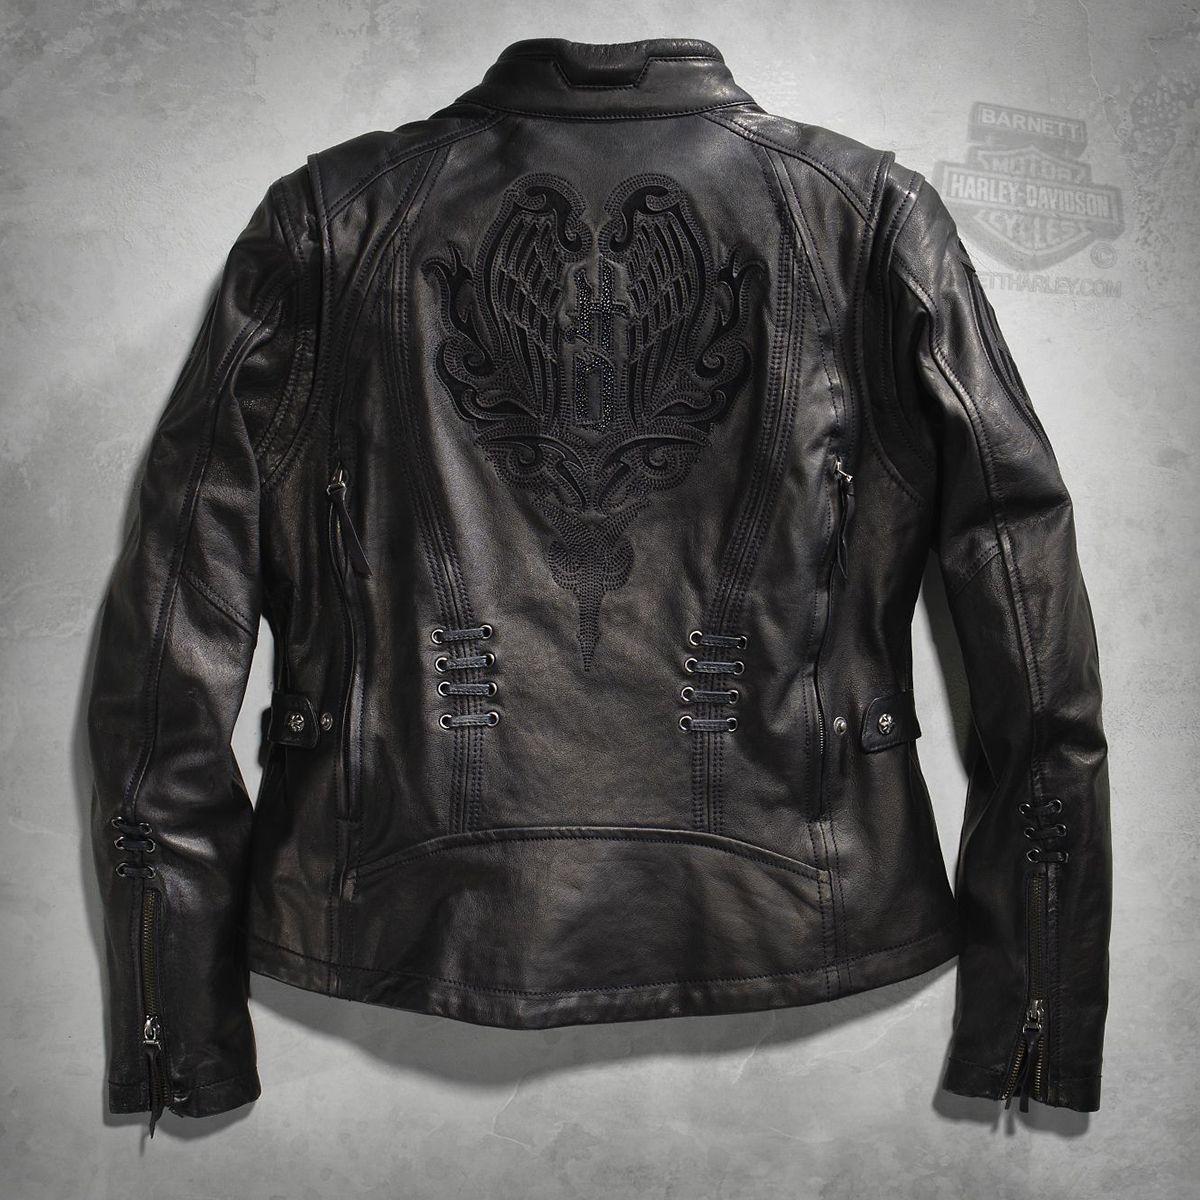 Harley Davidson Capitol Leather Jacket